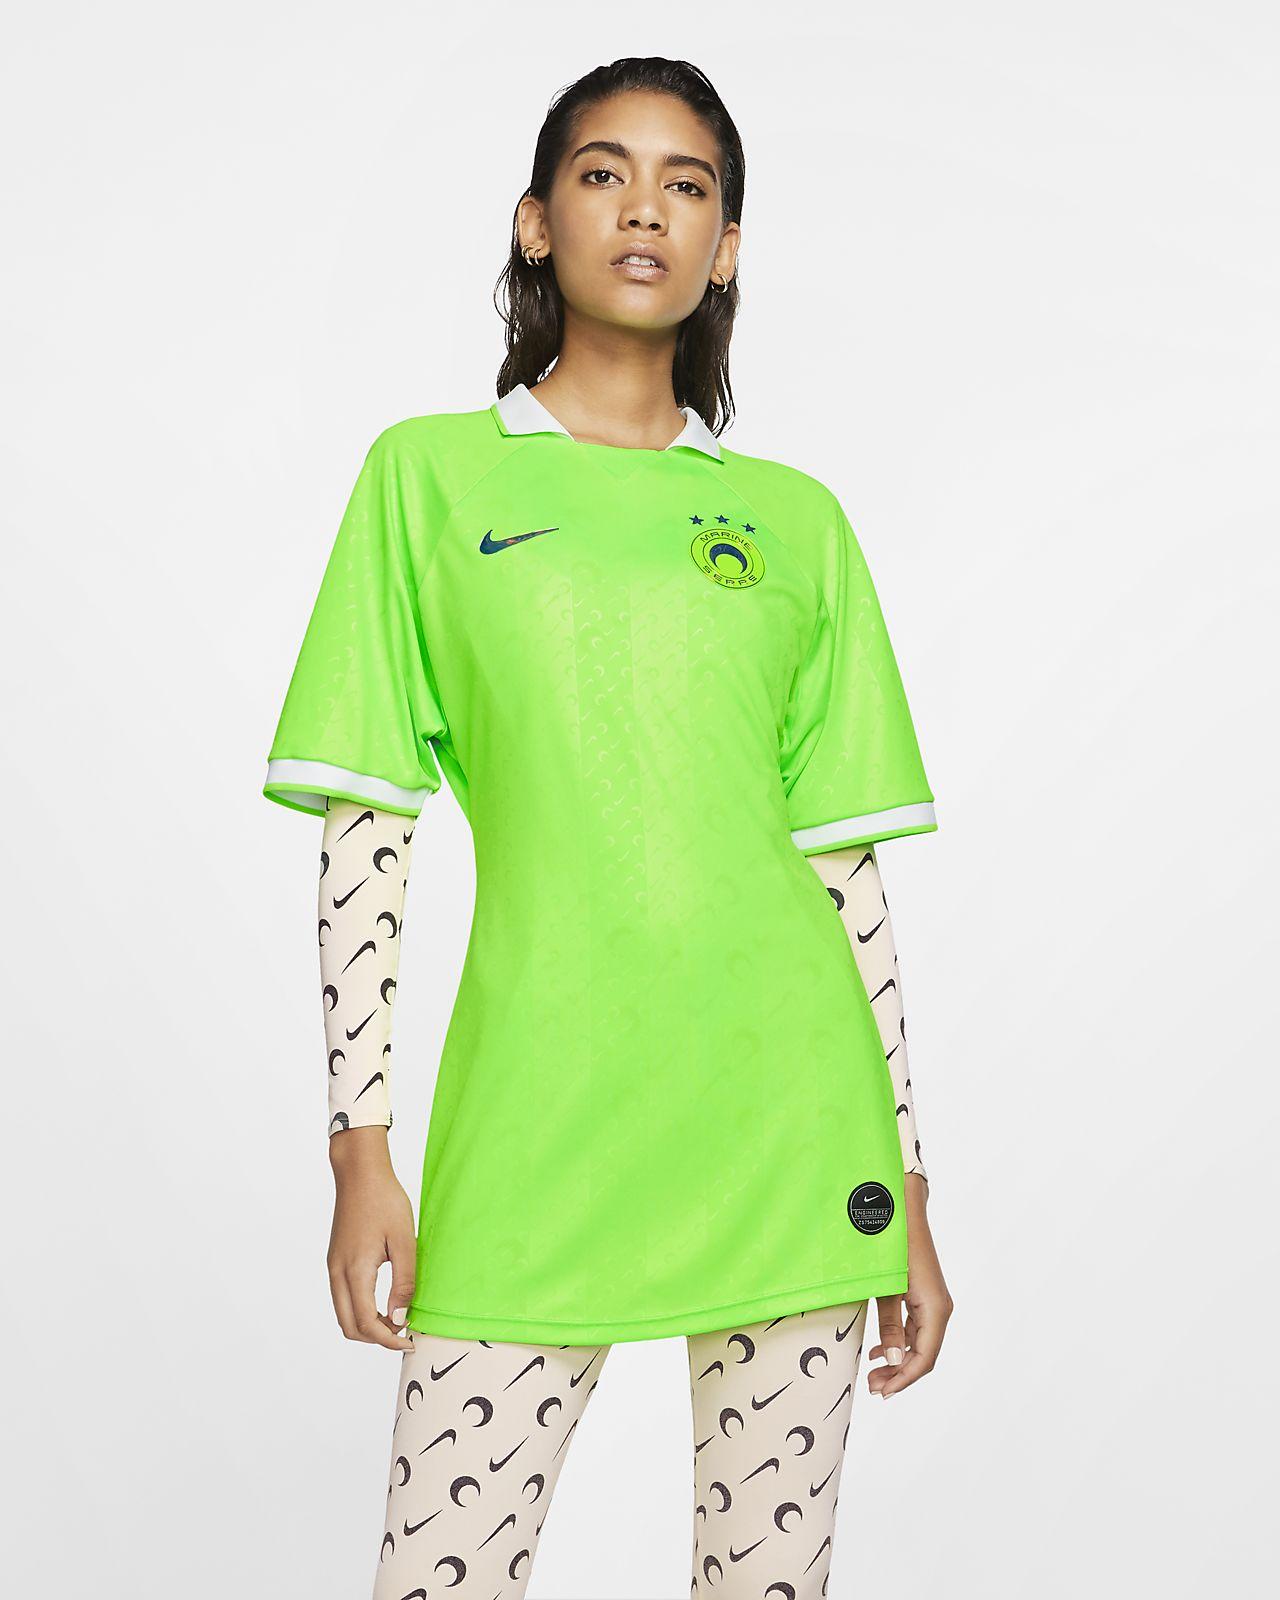 Damska koszulka 2 w 1 Nike x Marine Serre